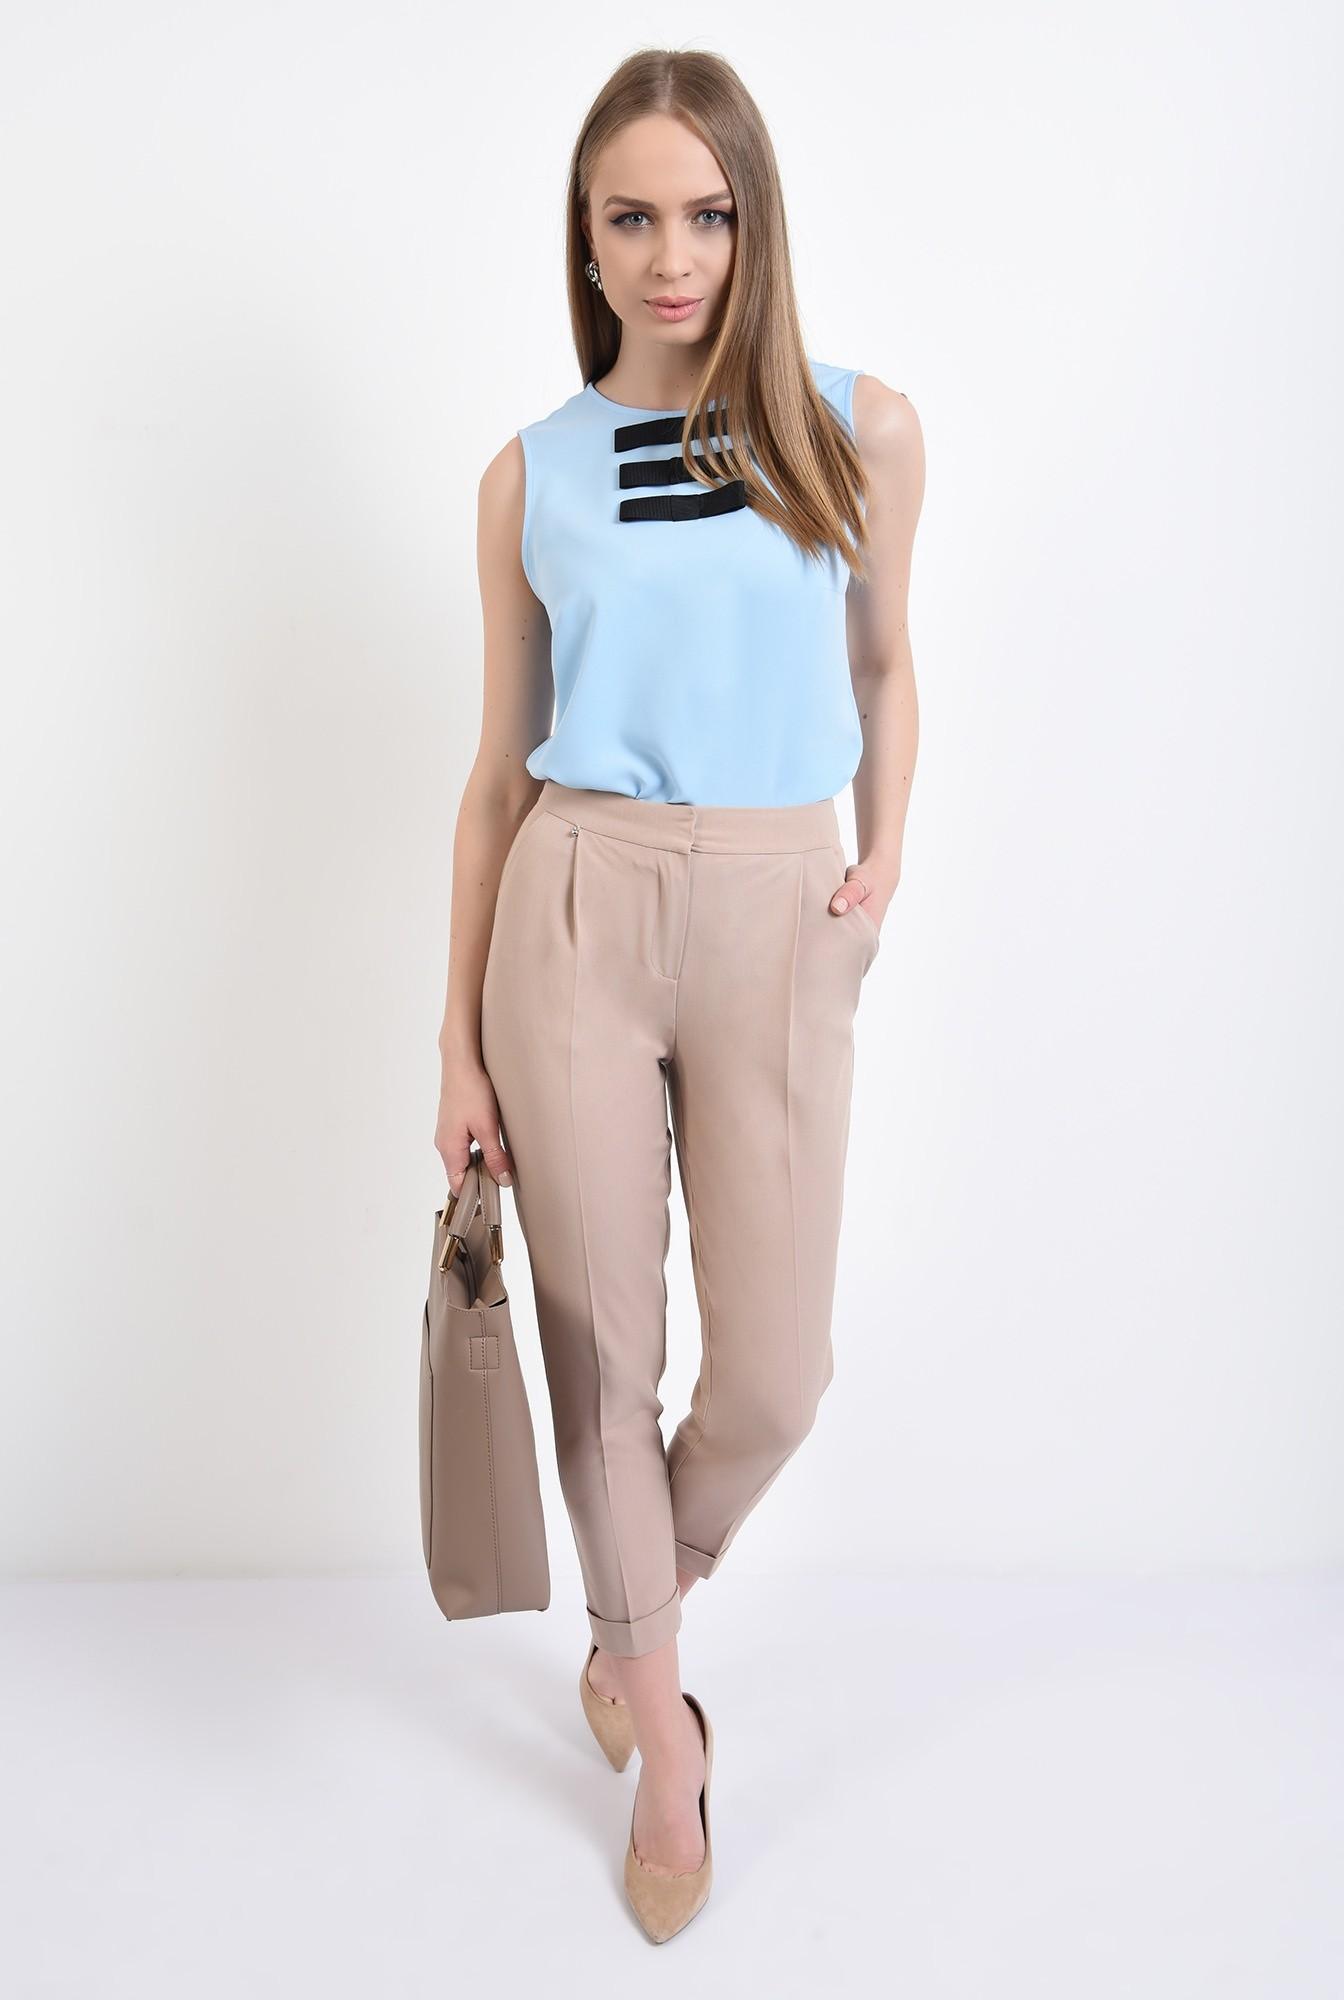 3 - bluza bleu, fara maneci, cu funde negre, bluza office